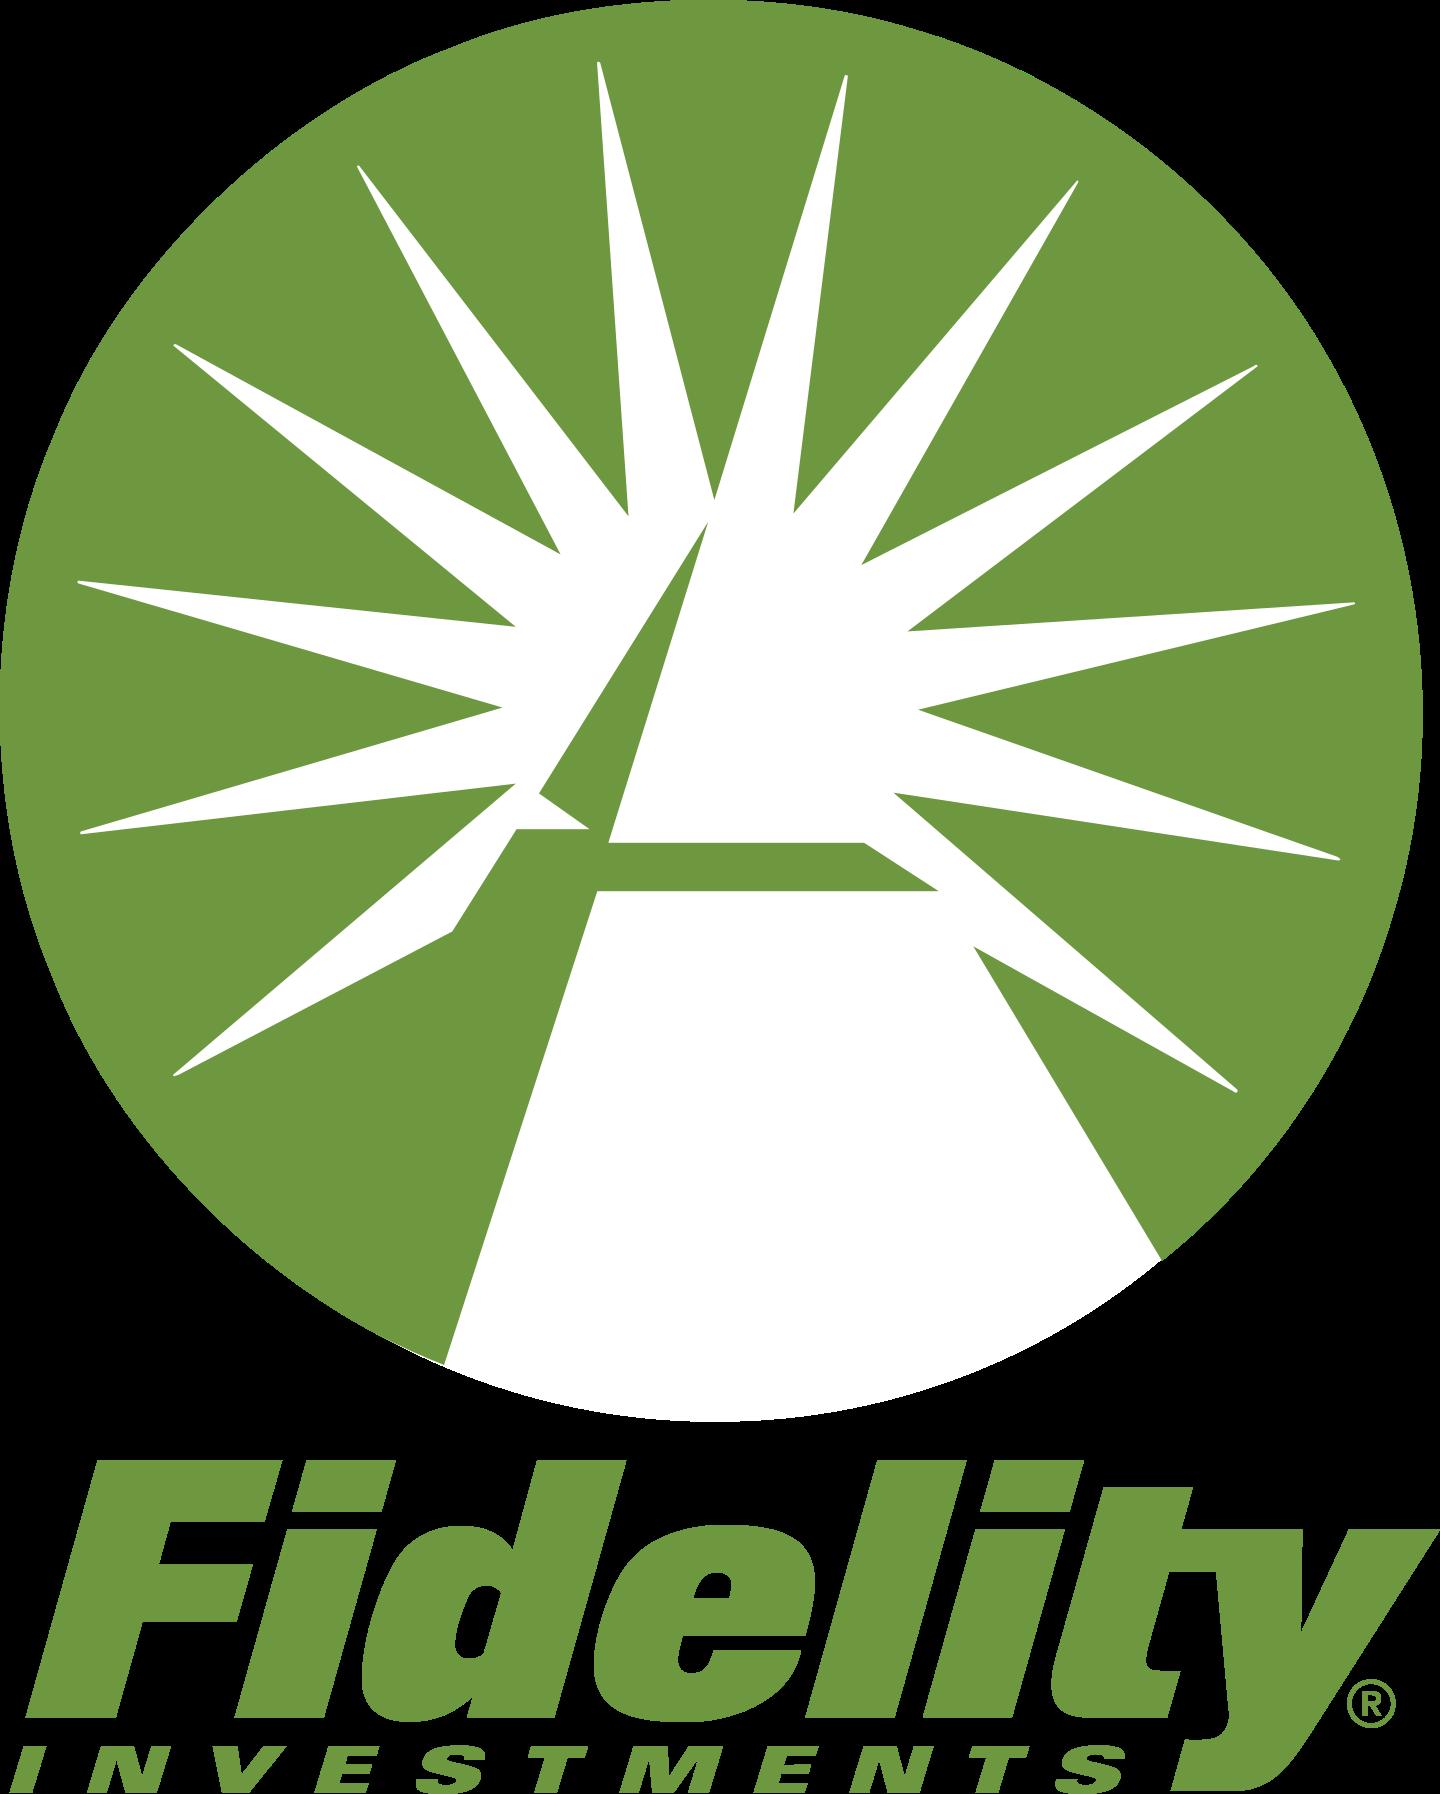 fidelity investments logo 7 - Fidelity Investments Logo